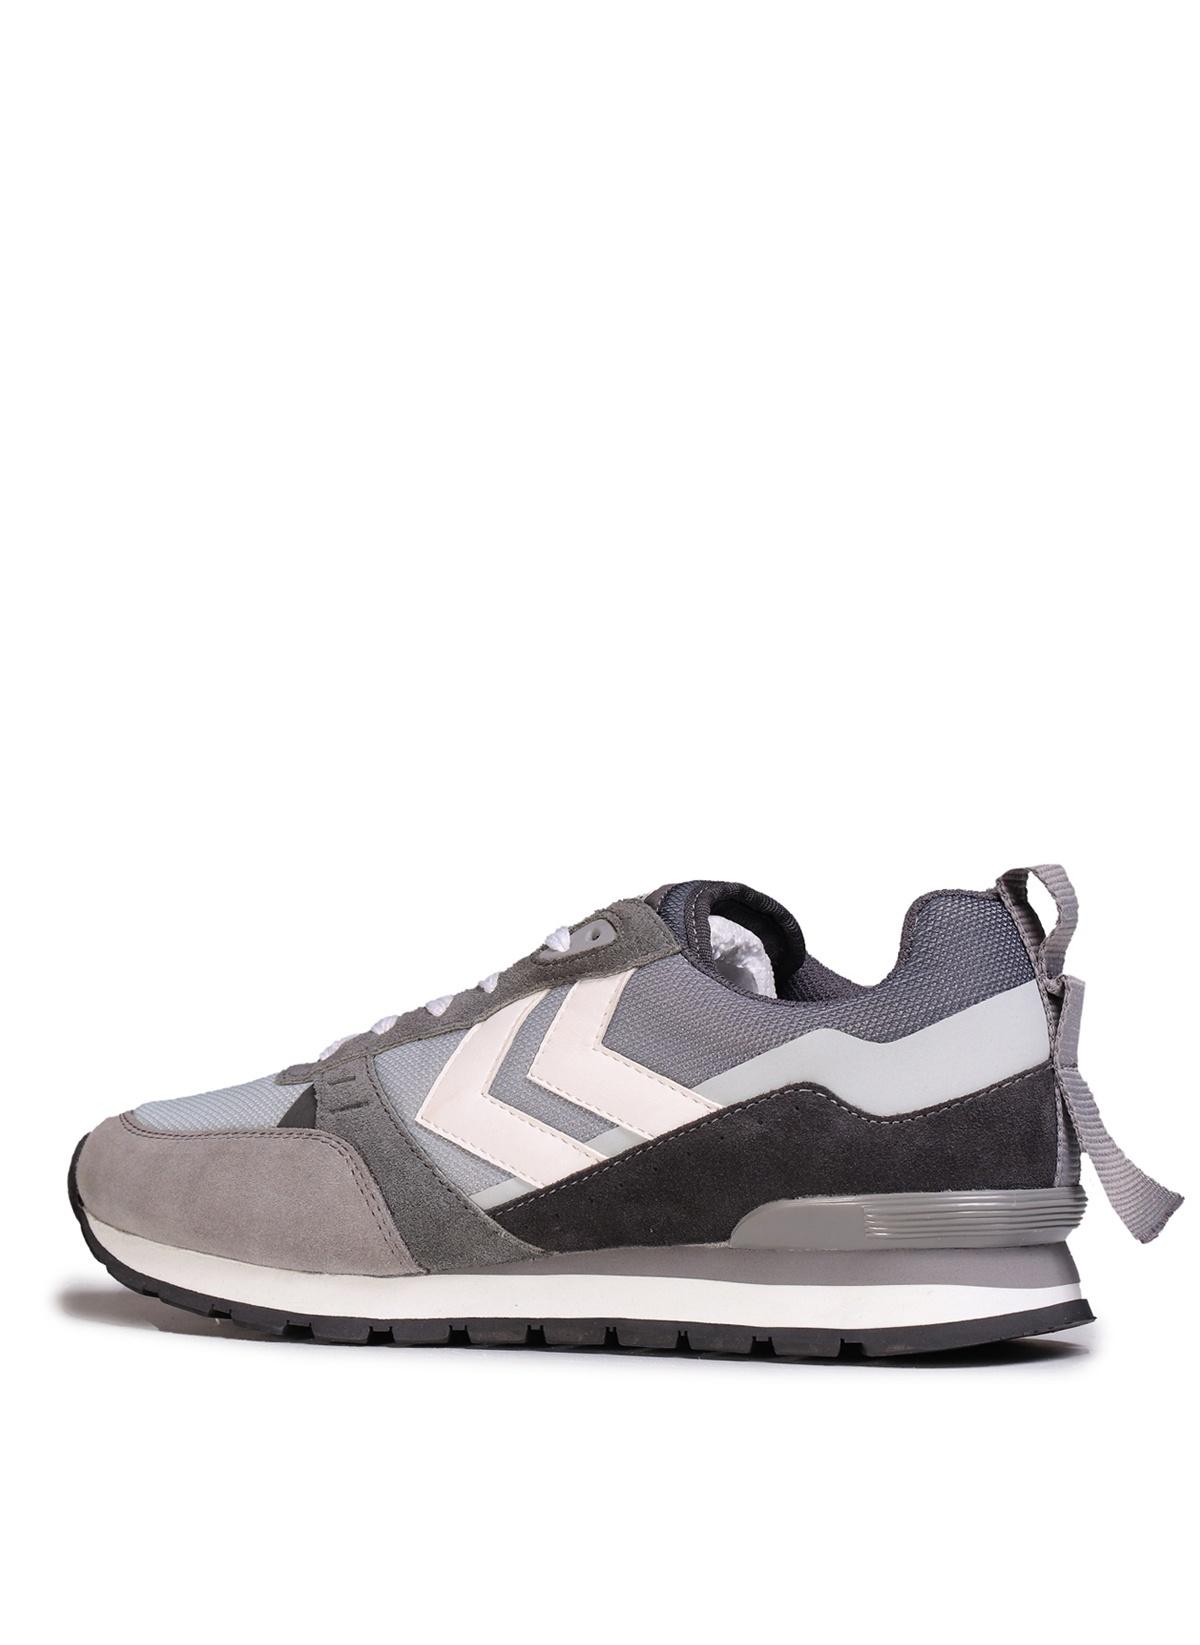 Hummel Kadin Sneakers Acik Gri Morhipo 28949685